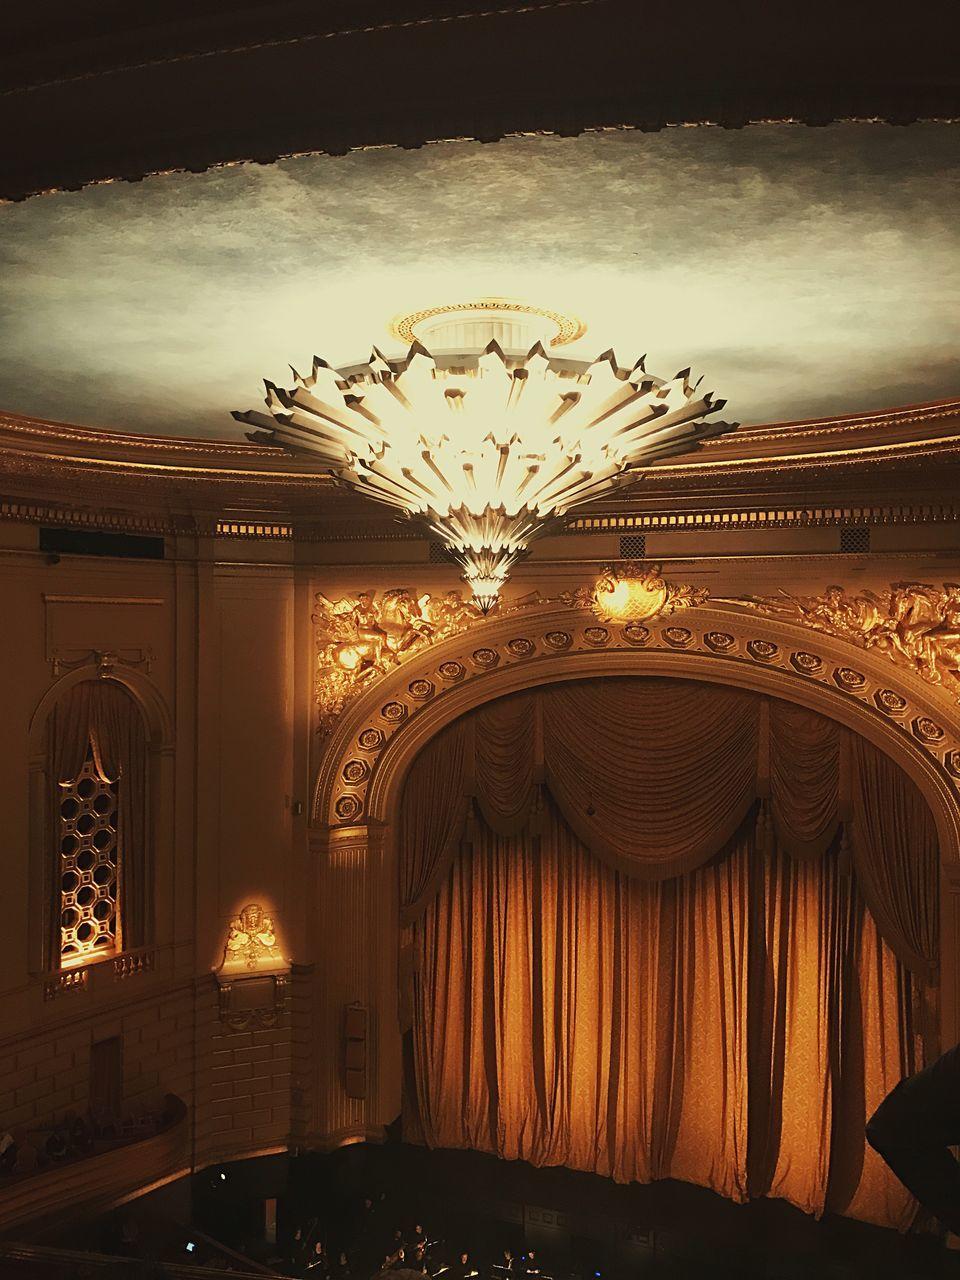 illuminated, night, curtain, no people, luxury, indoors, architecture, luxury hotel, sky, flower, nature